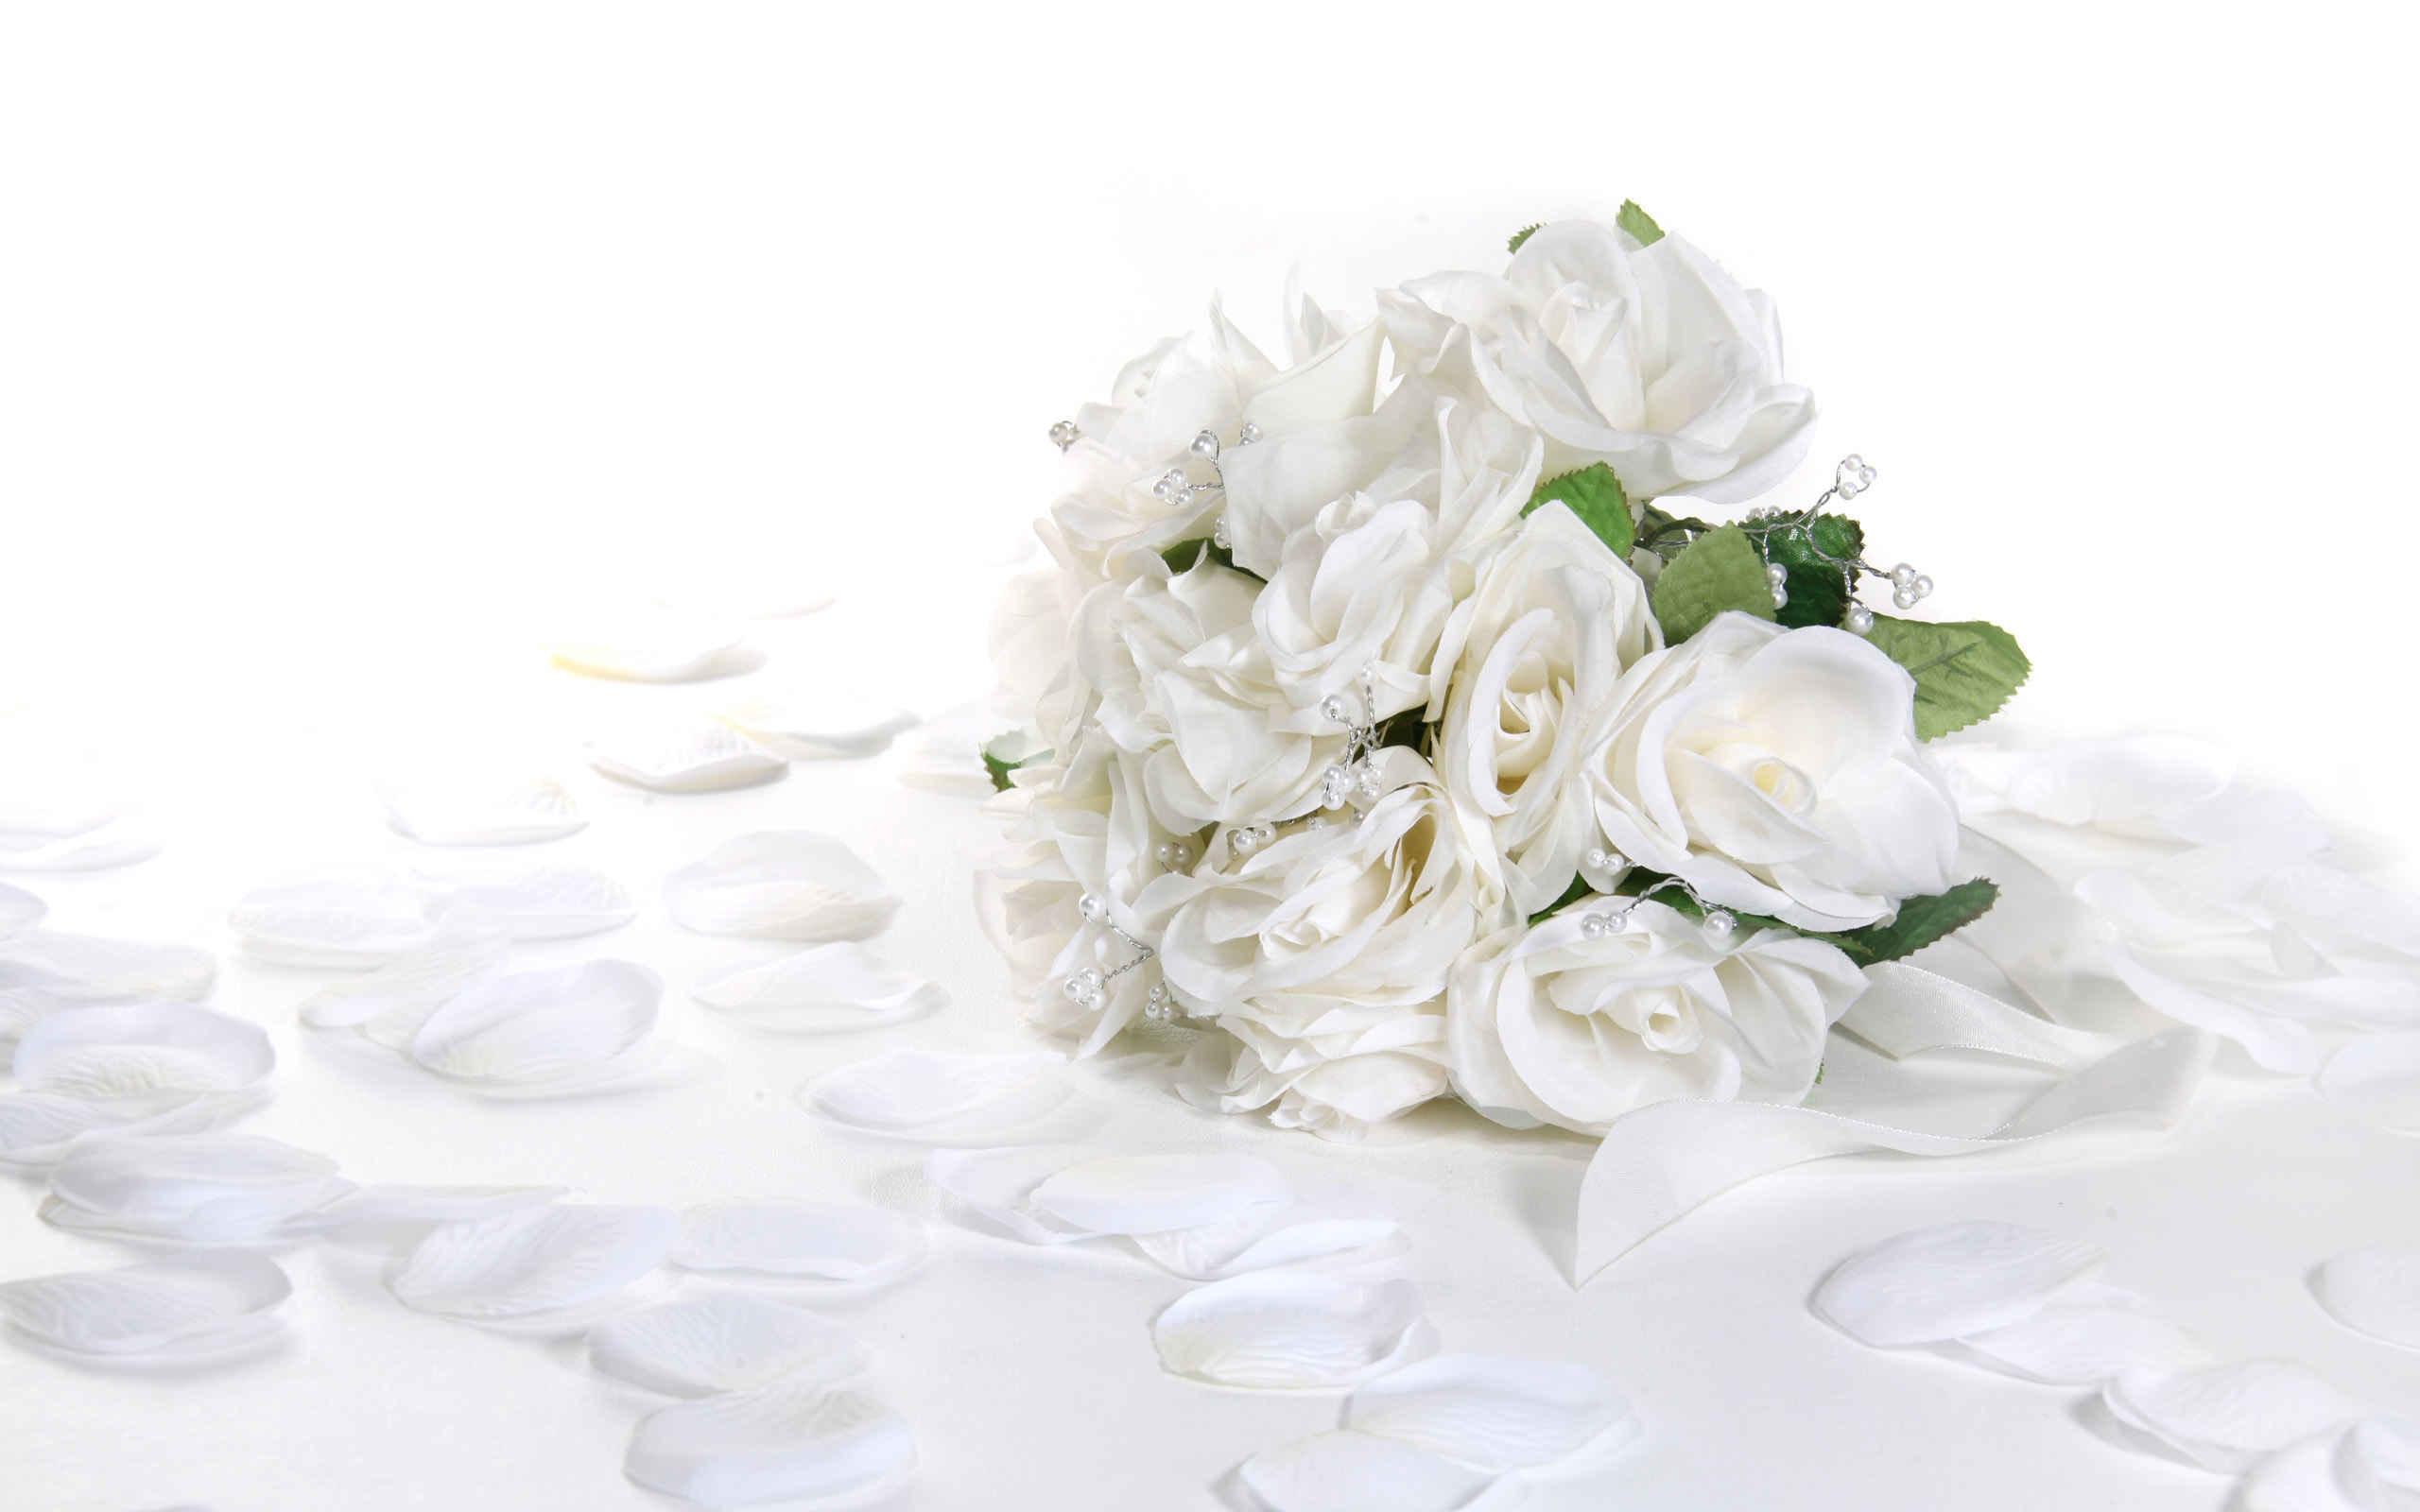 تصاویر گل رز